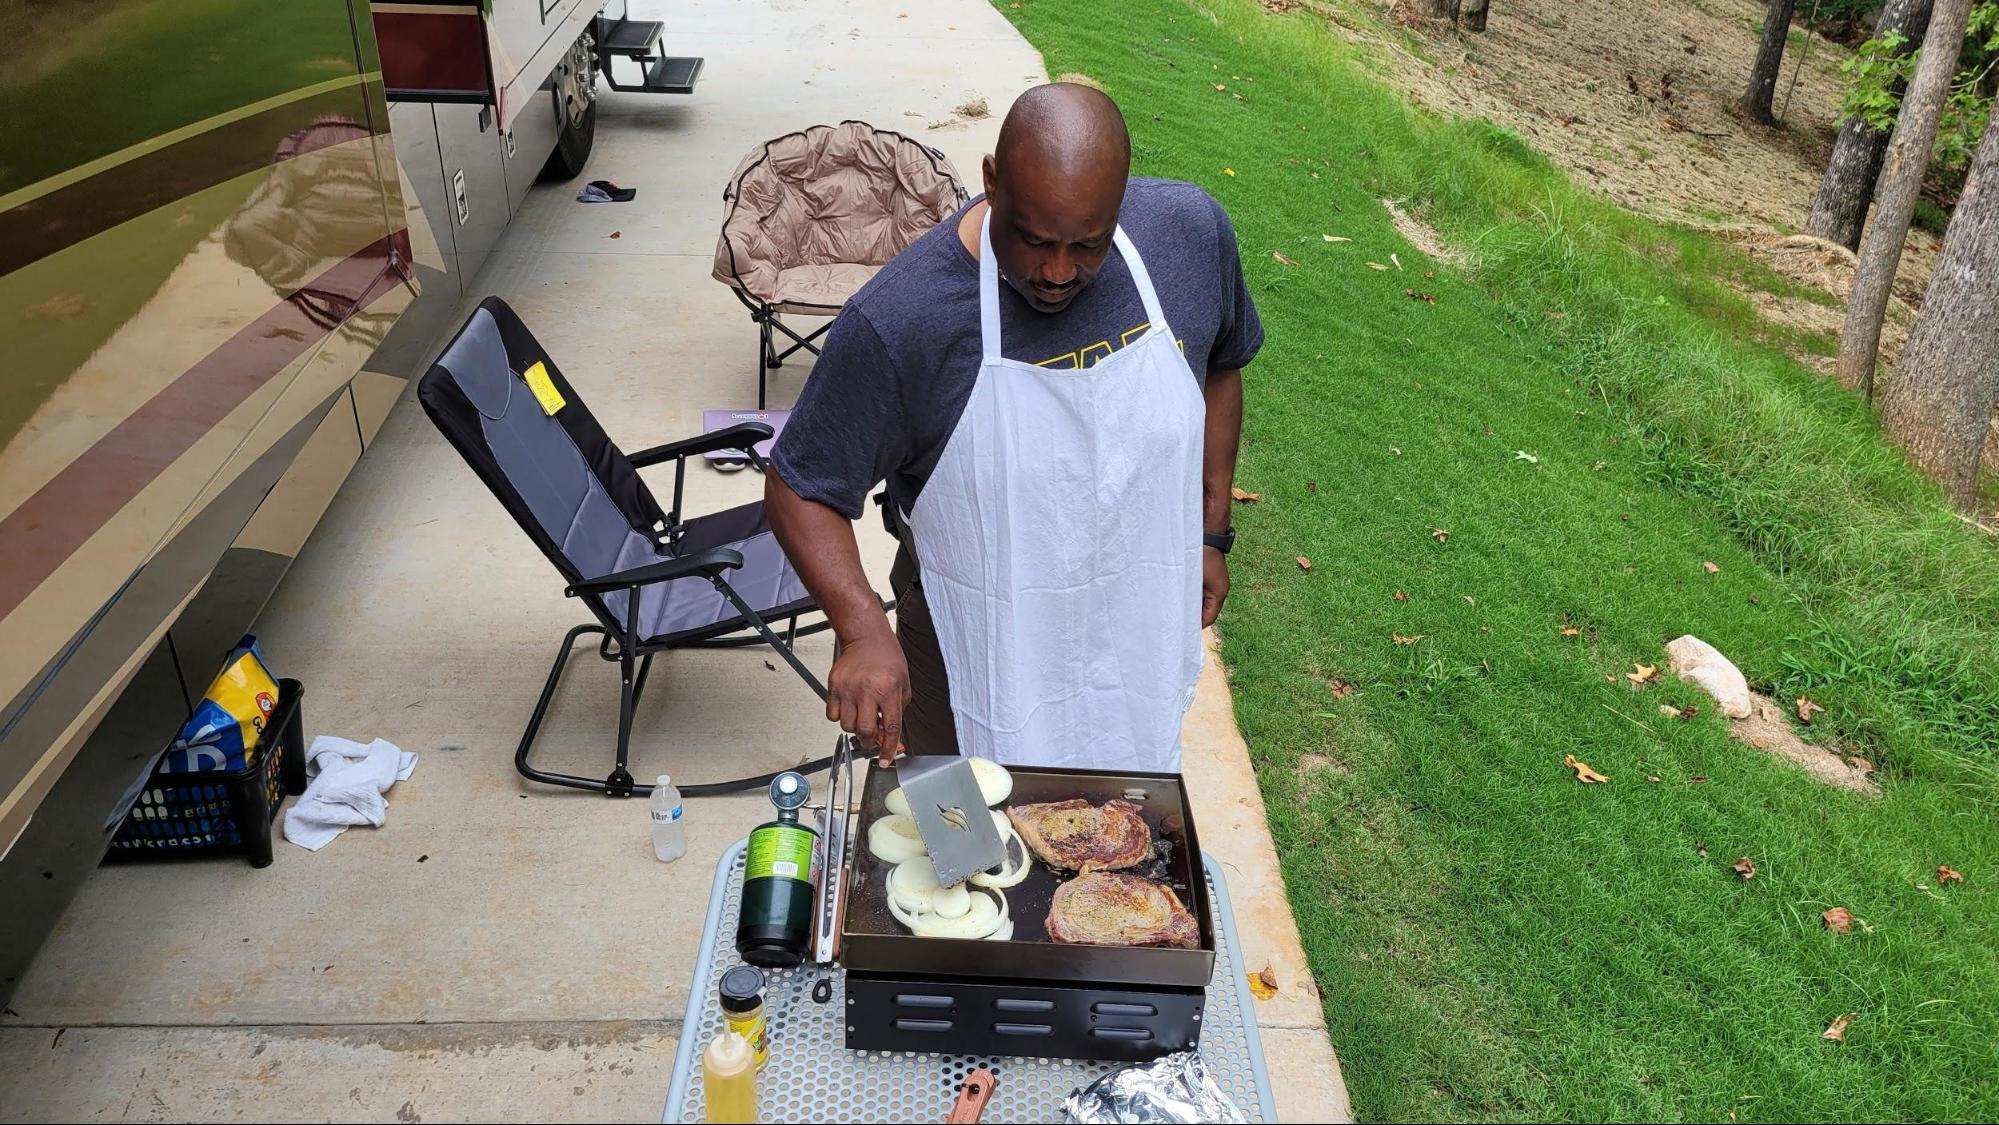 keith sims grilling at rv